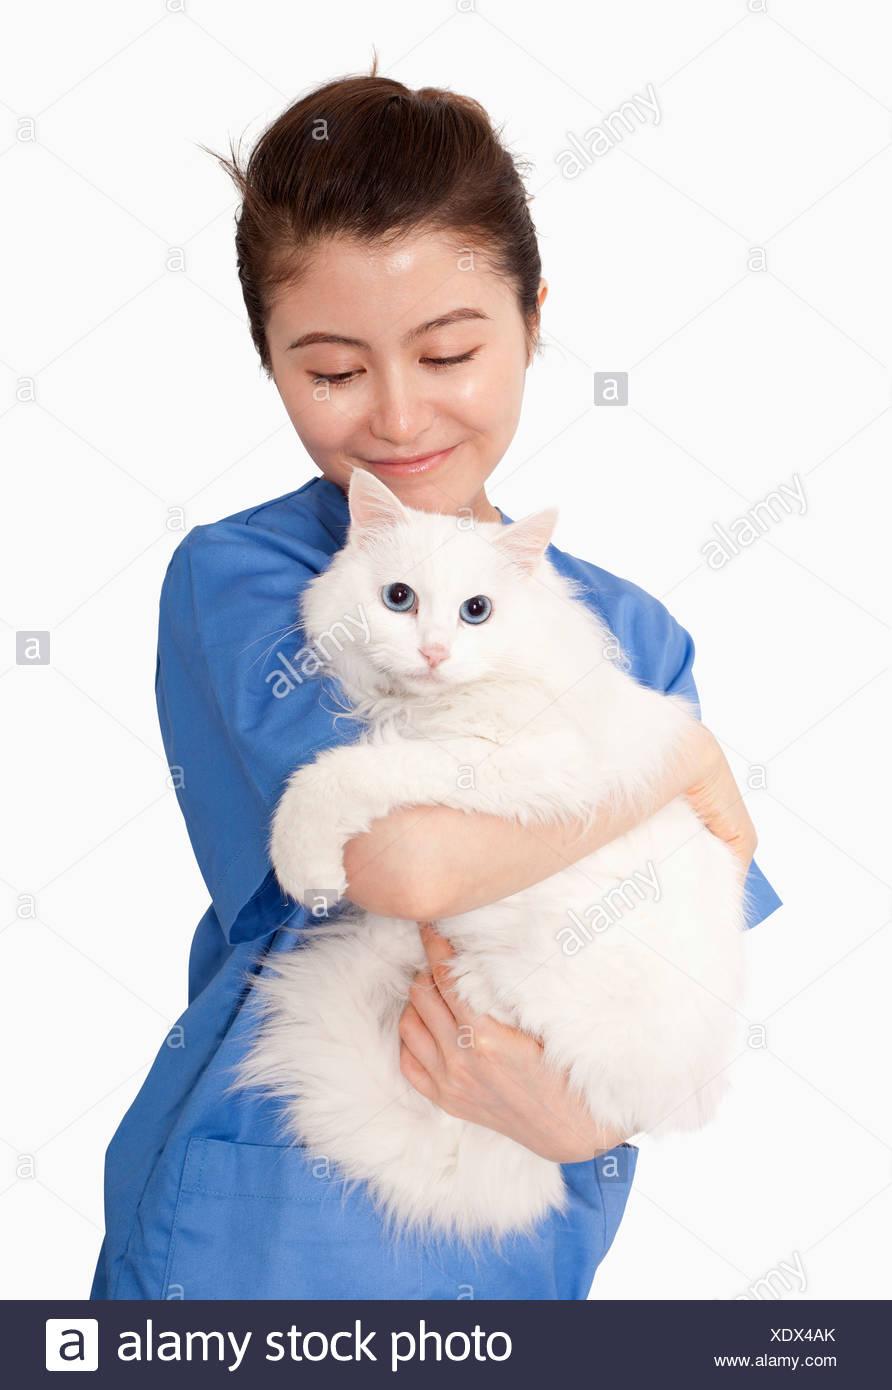 Portrait of female veterinarian holding a white cat - Stock Image